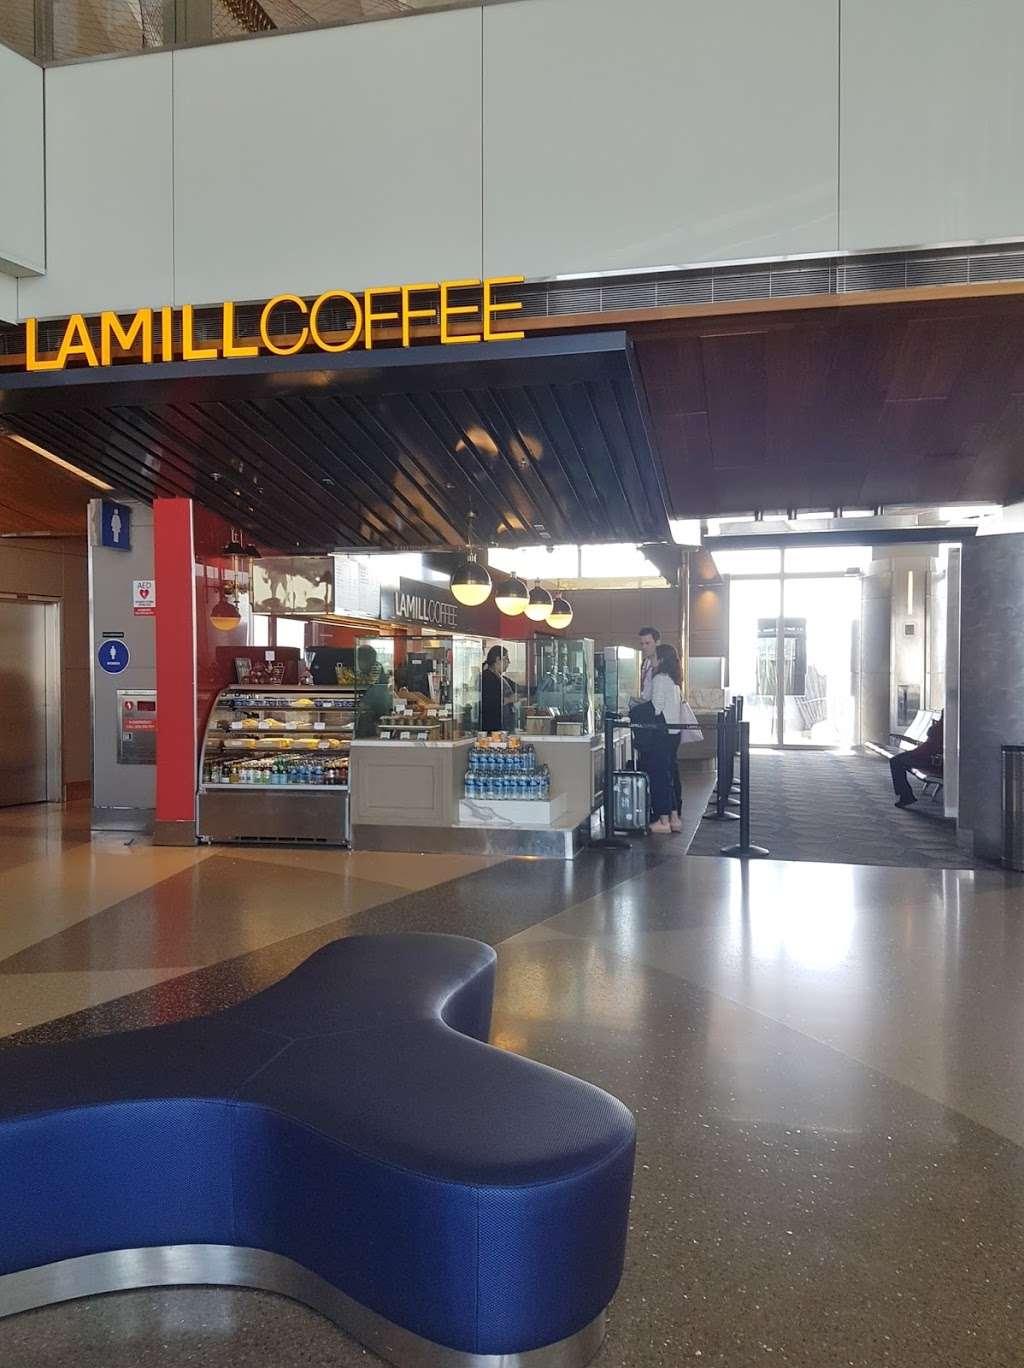 Lamill Coffee - cafe    Photo 3 of 10   Address: Los Angeles, CA 90045, USA   Phone: (310) 646-1770